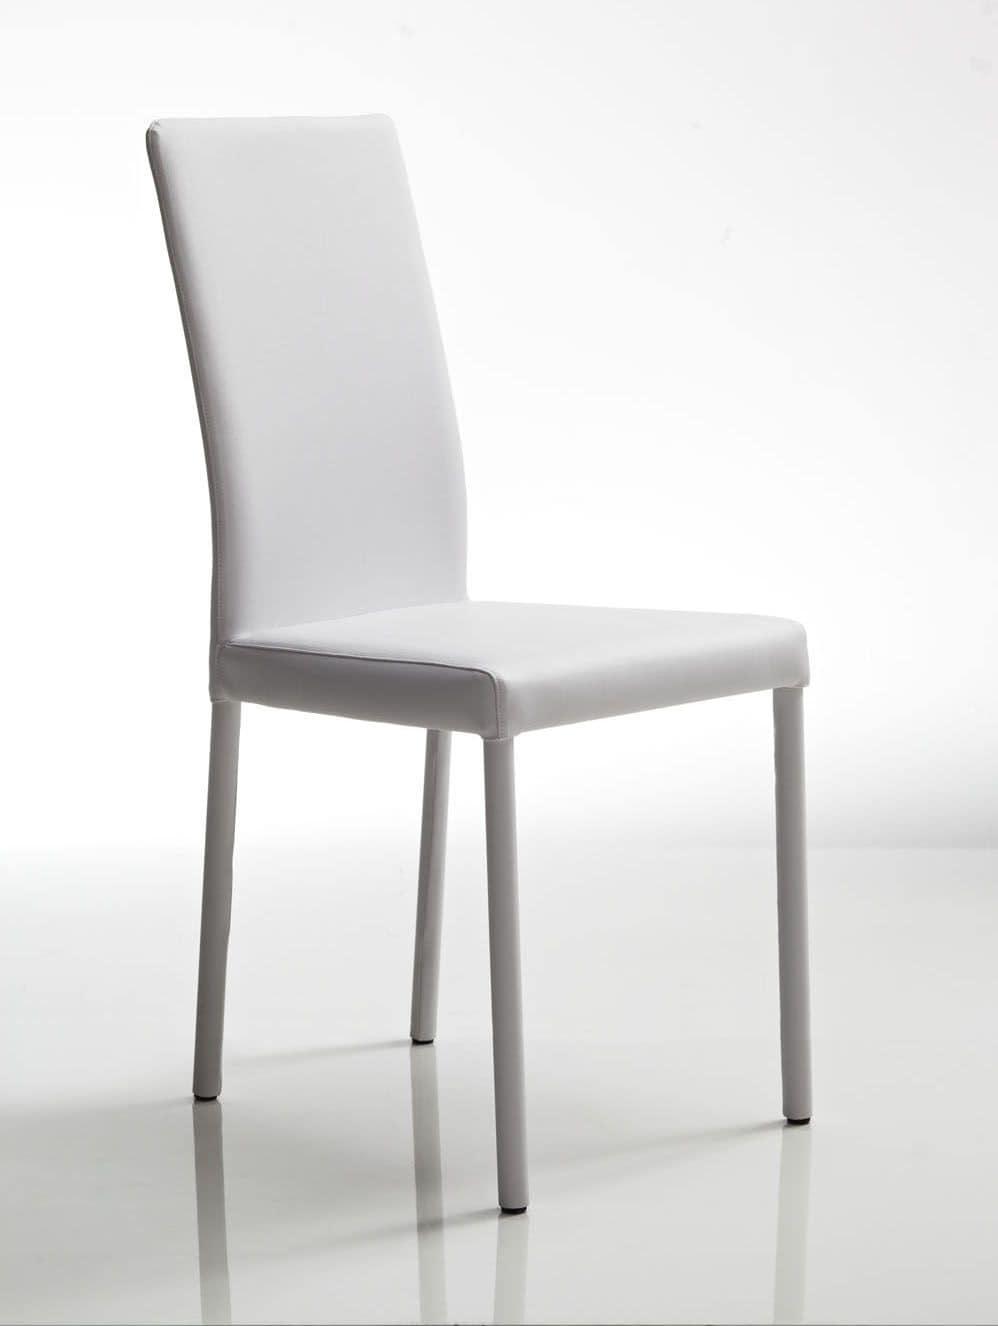 Sedia in pelle bianca struttura in acciaio per uso for Sedie in acciaio